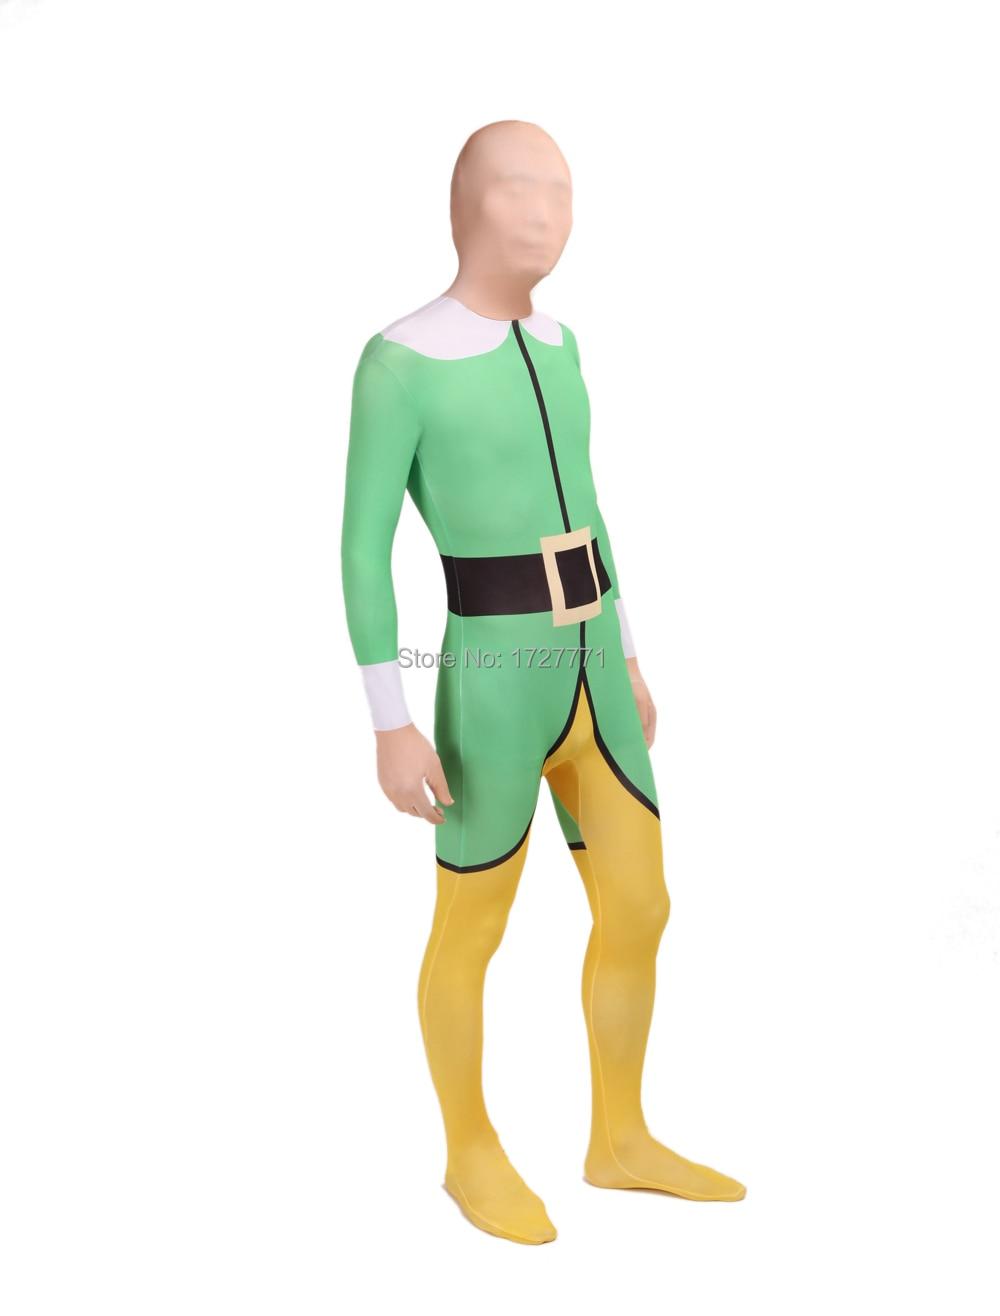 (jxy026) Full Body Lycra Spandex Zentai Suit Motivo Della Tuta Halloween Costume Party Irrestringibile